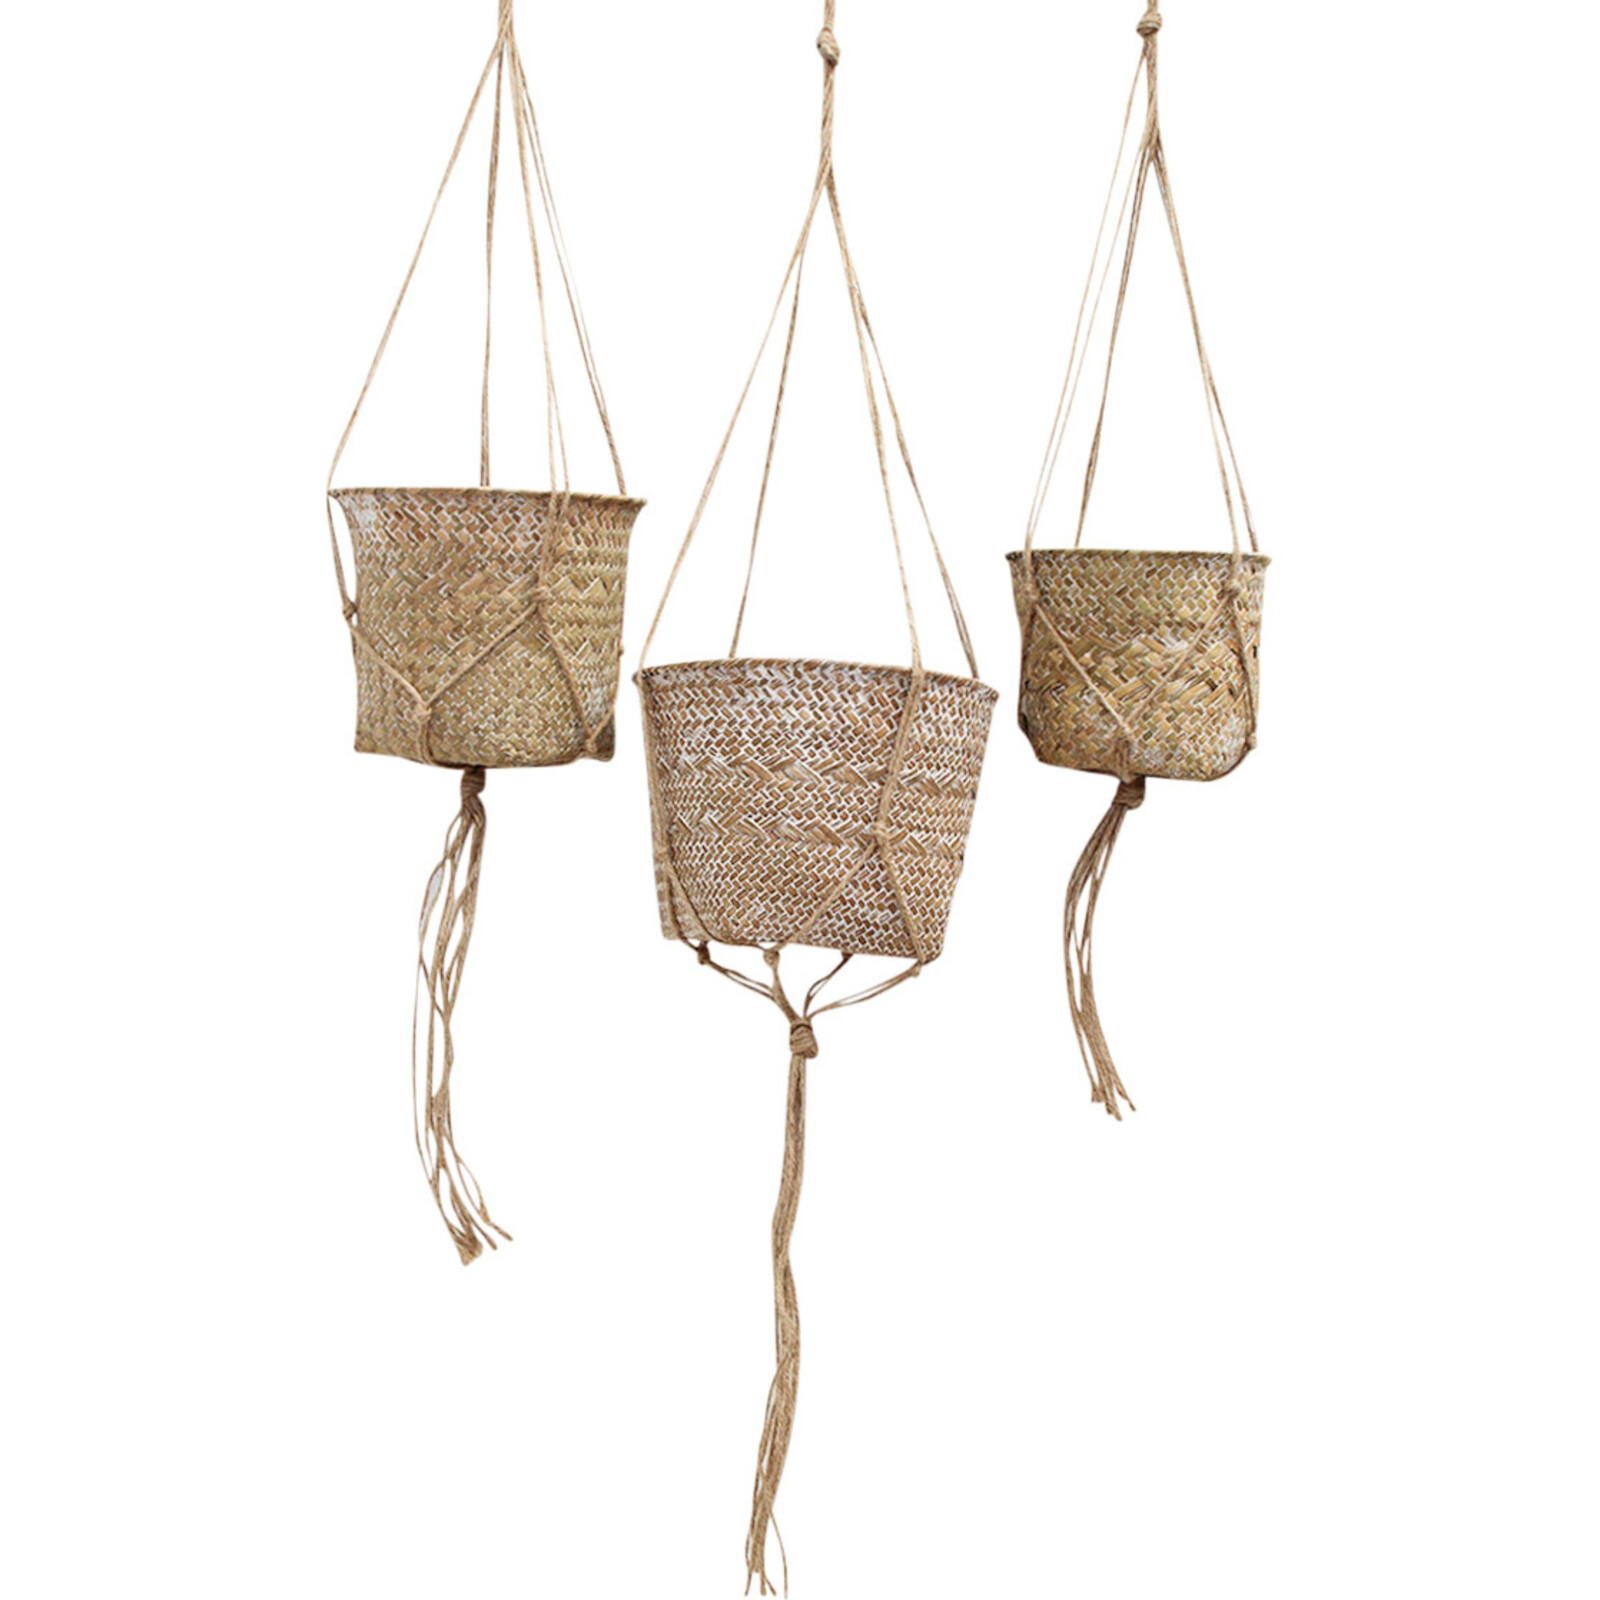 Woven Basket Rope Hanger S/3